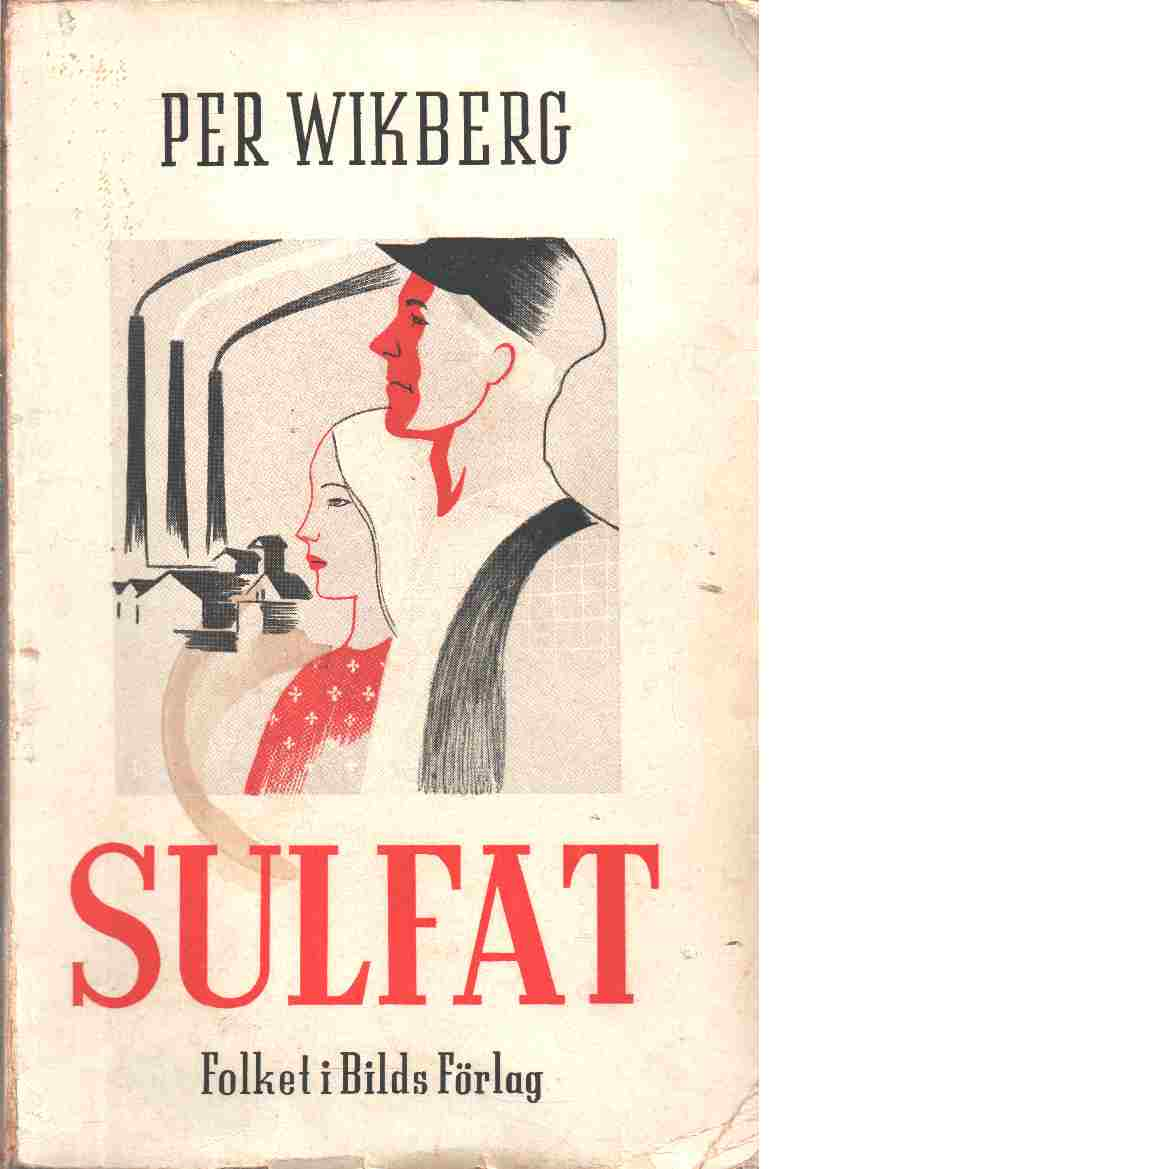 Sulfat - Wikberg, Per